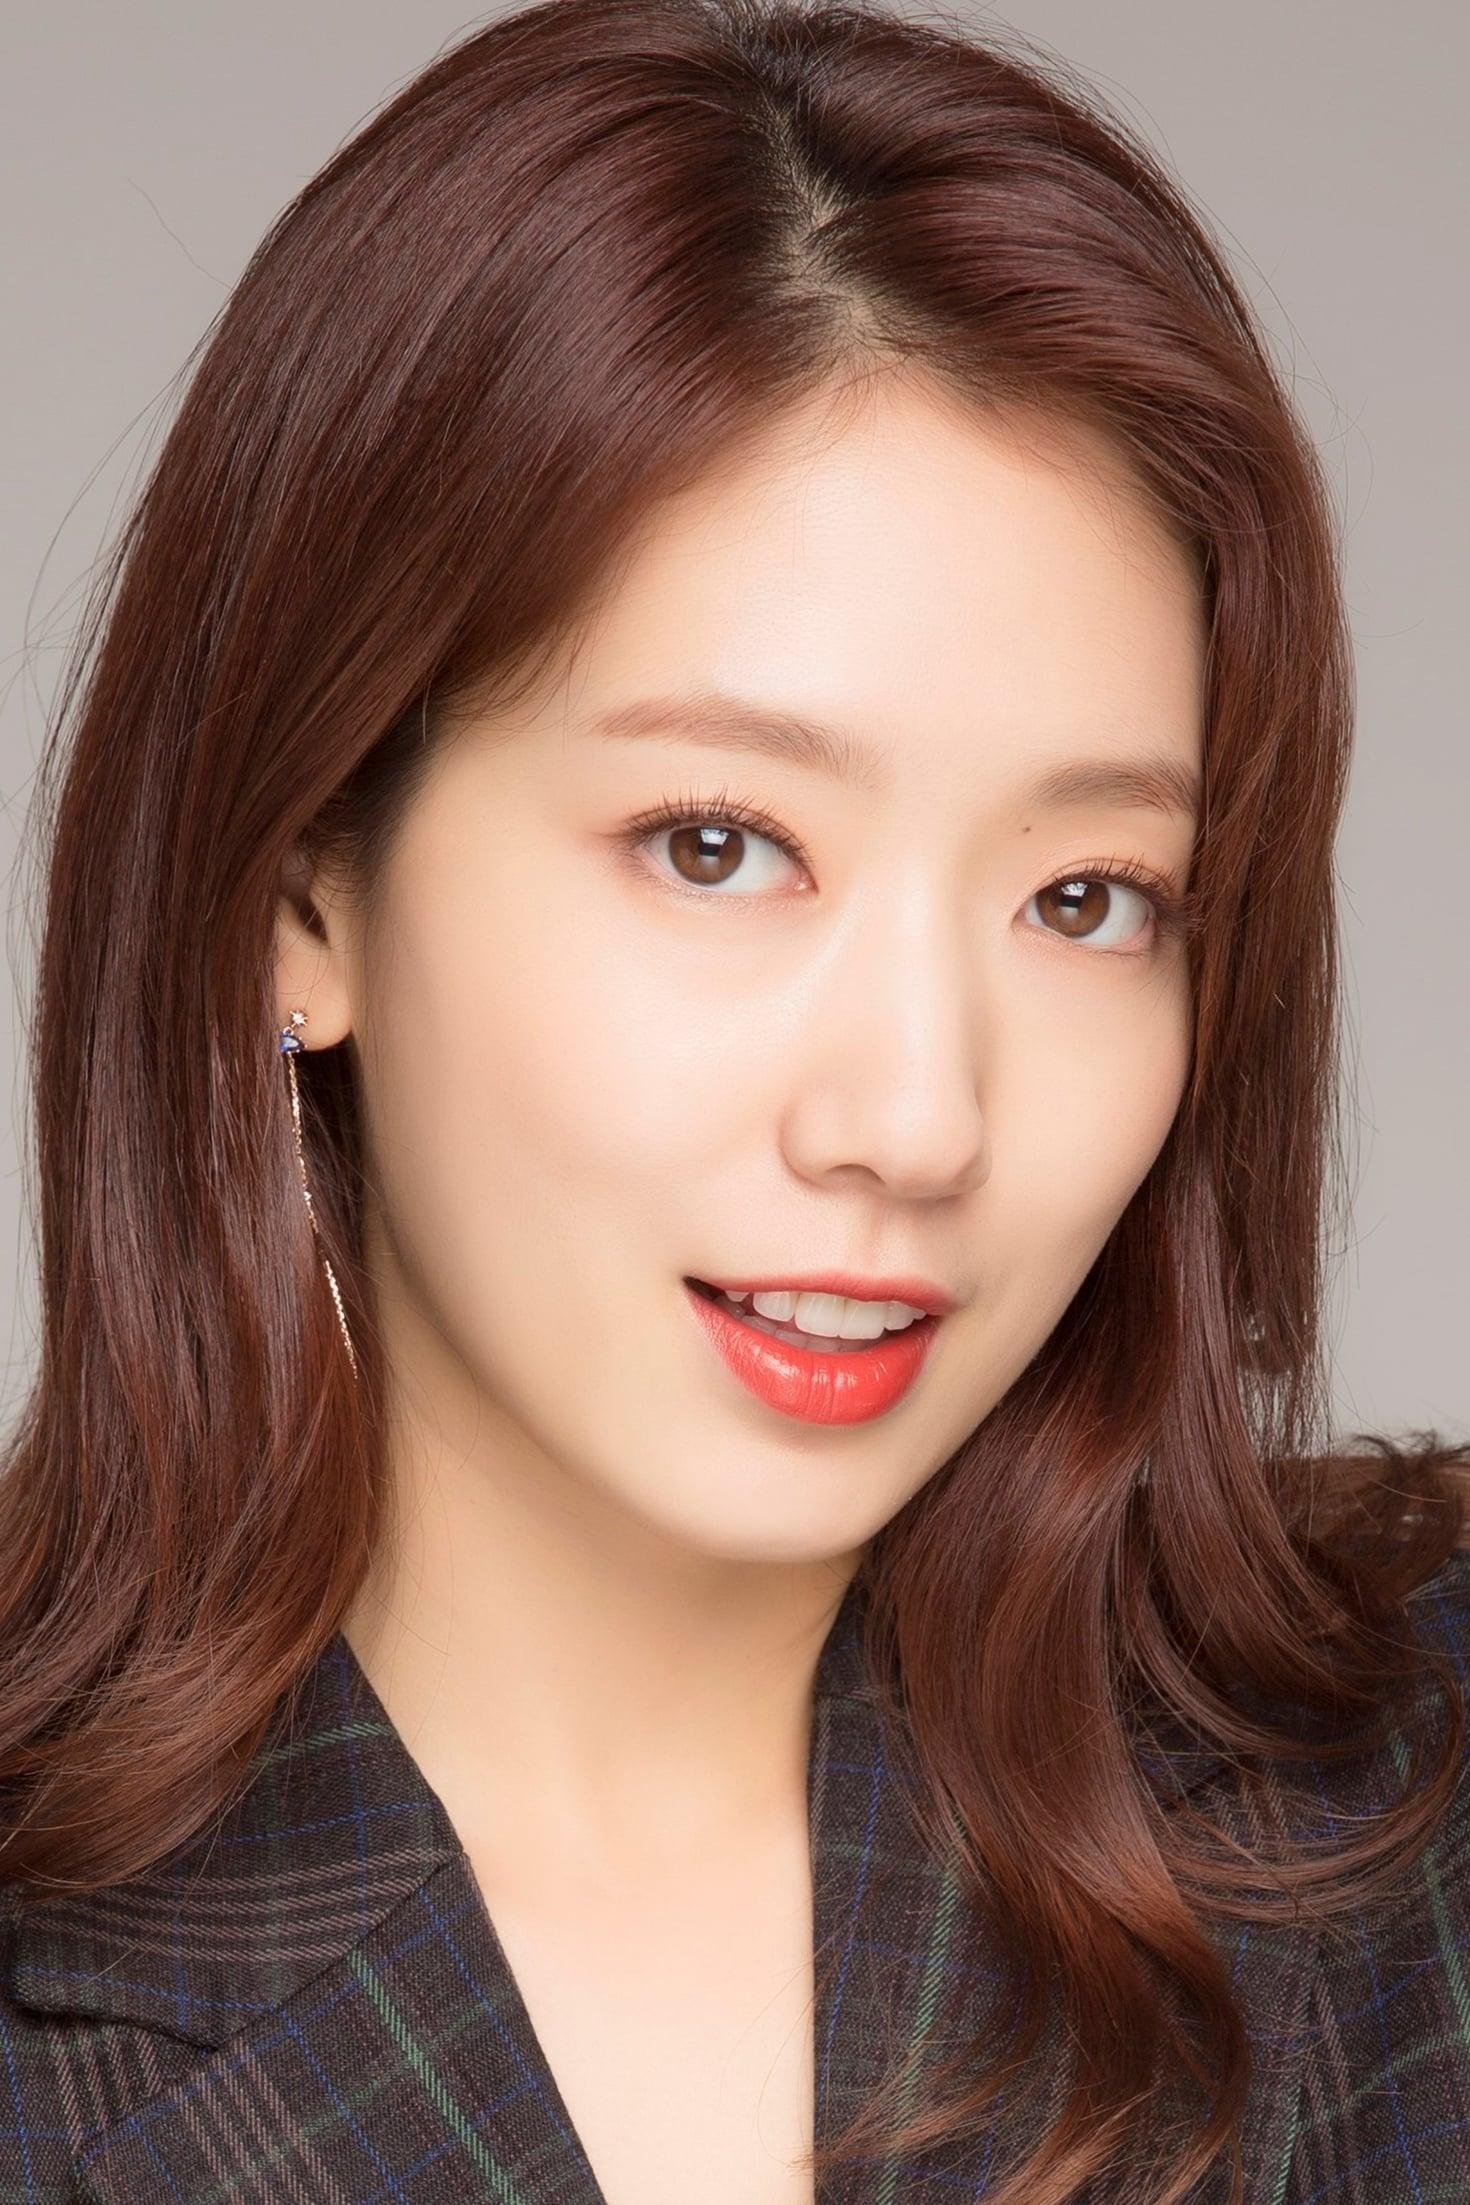 Park Shin-hye - Watch Solarmovie